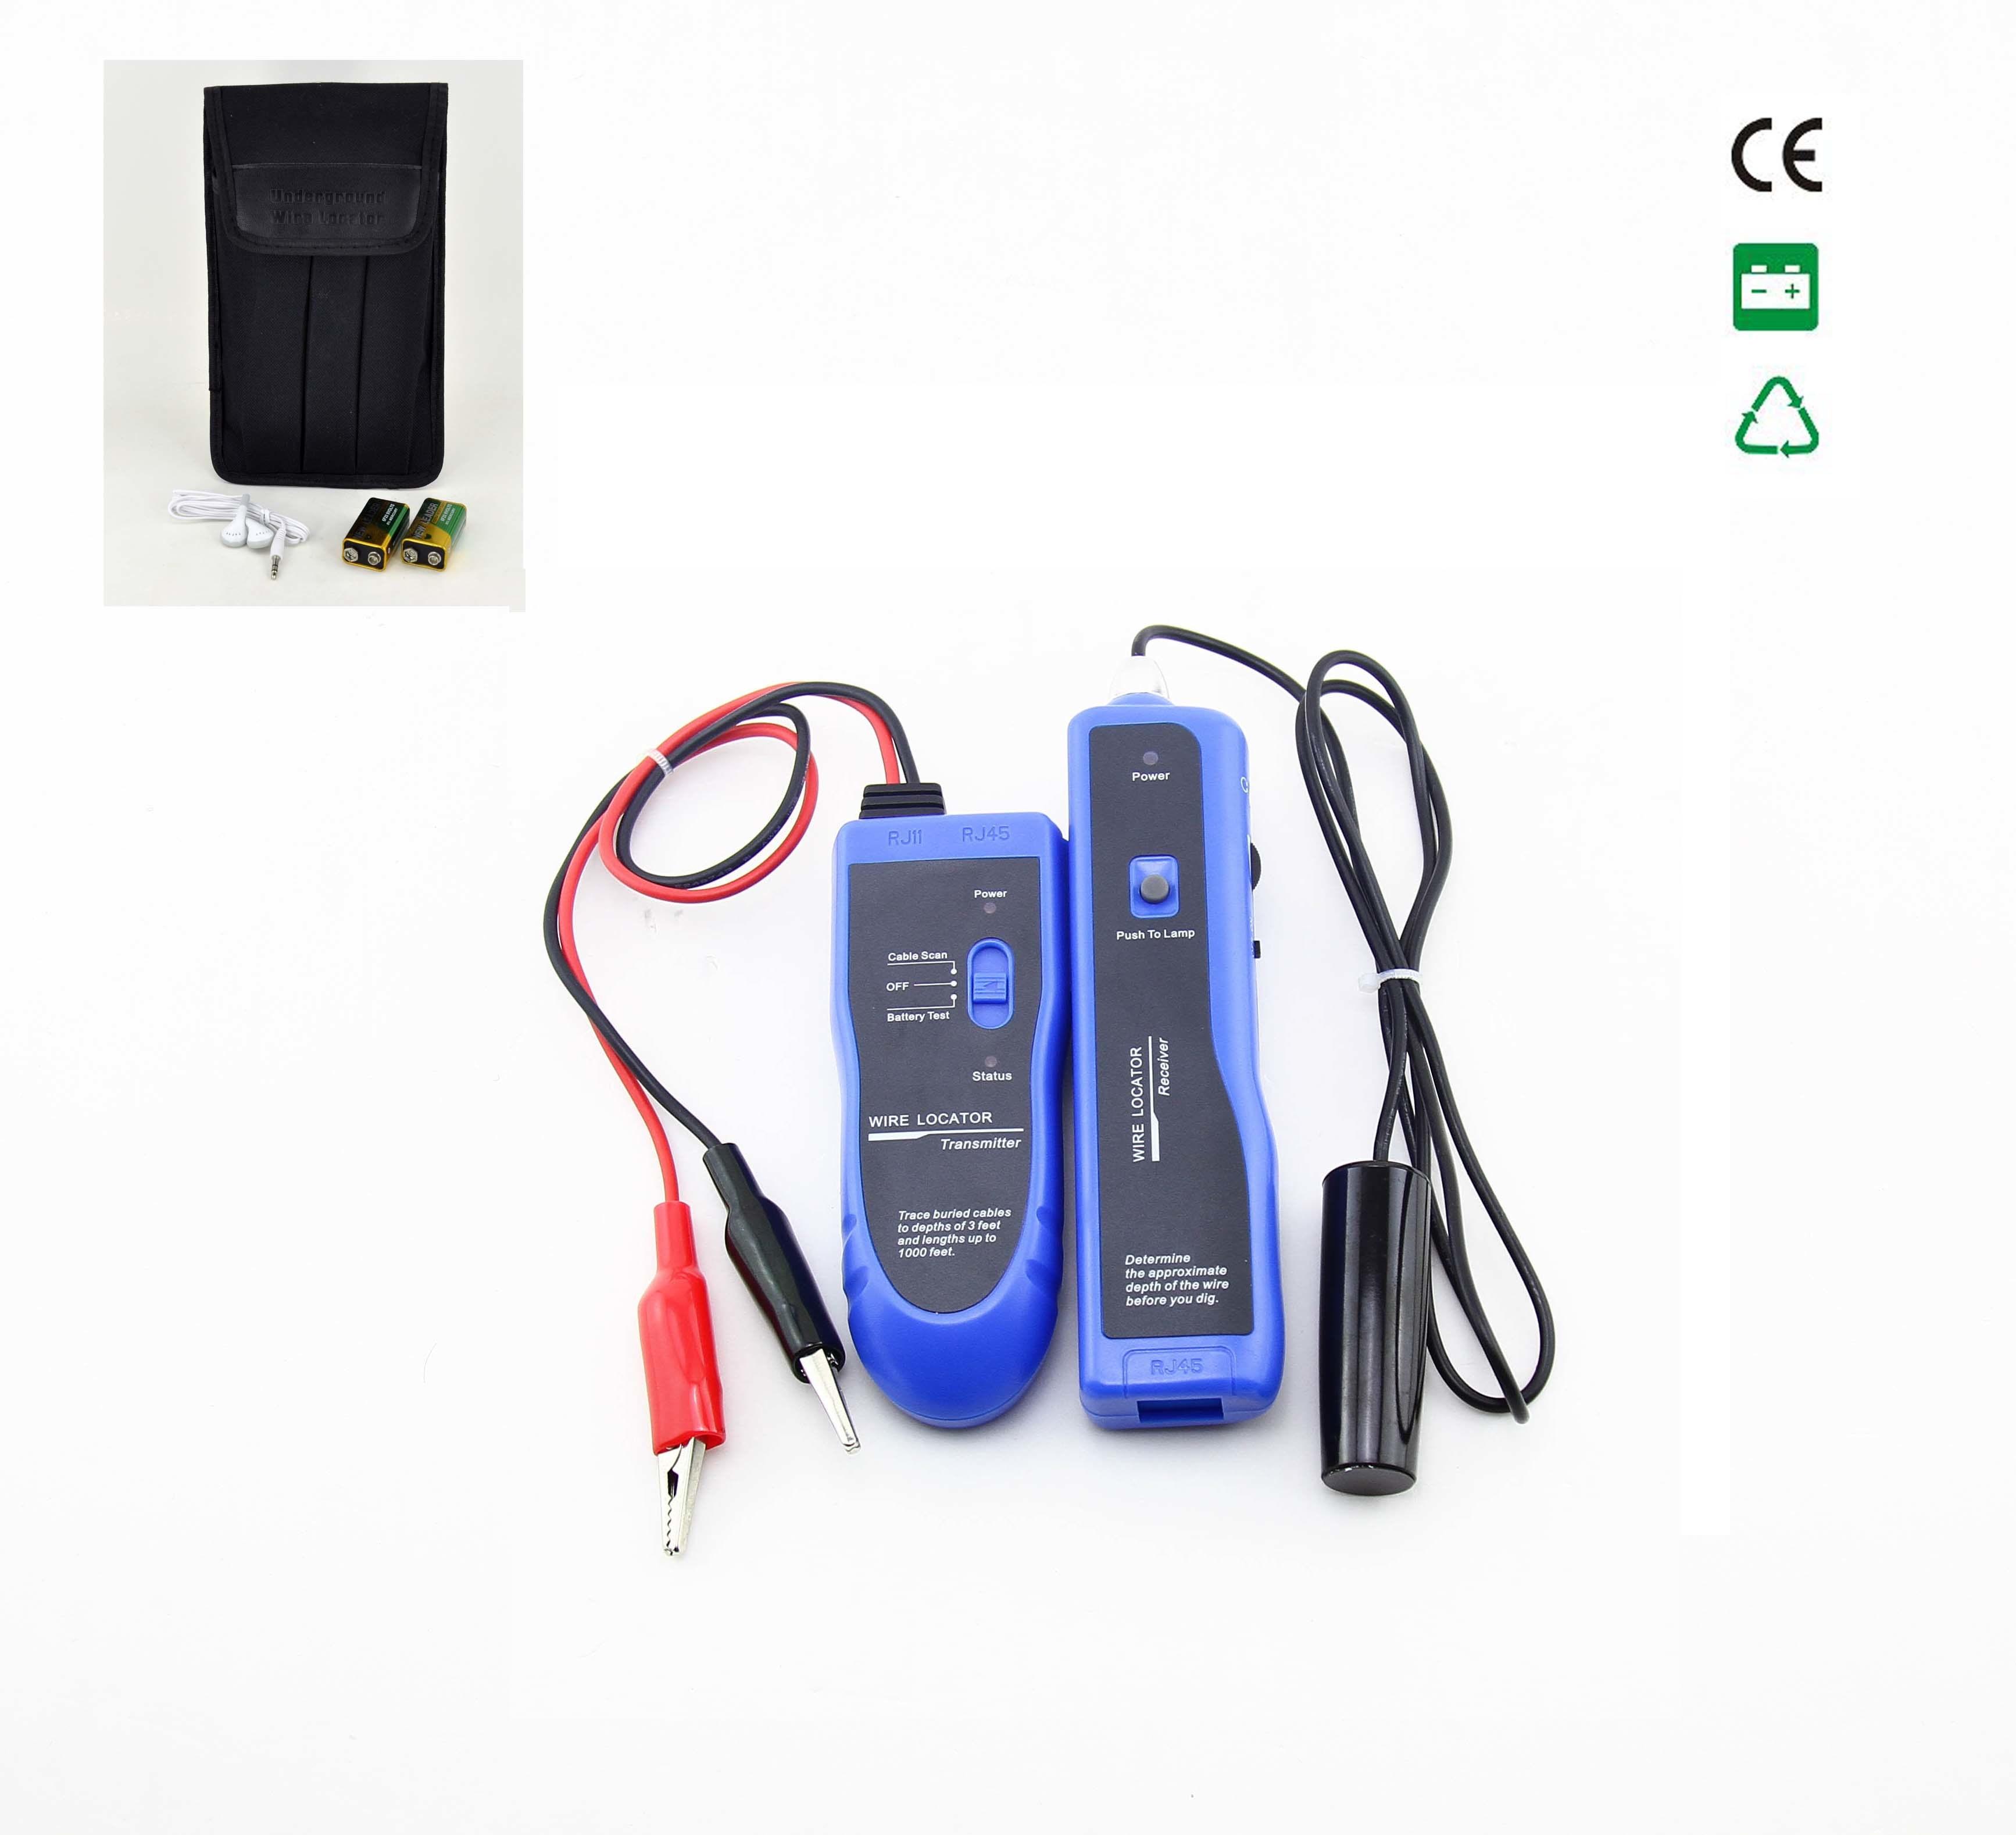 Wire Locator Detector : China hidden cable wire locator detector nf